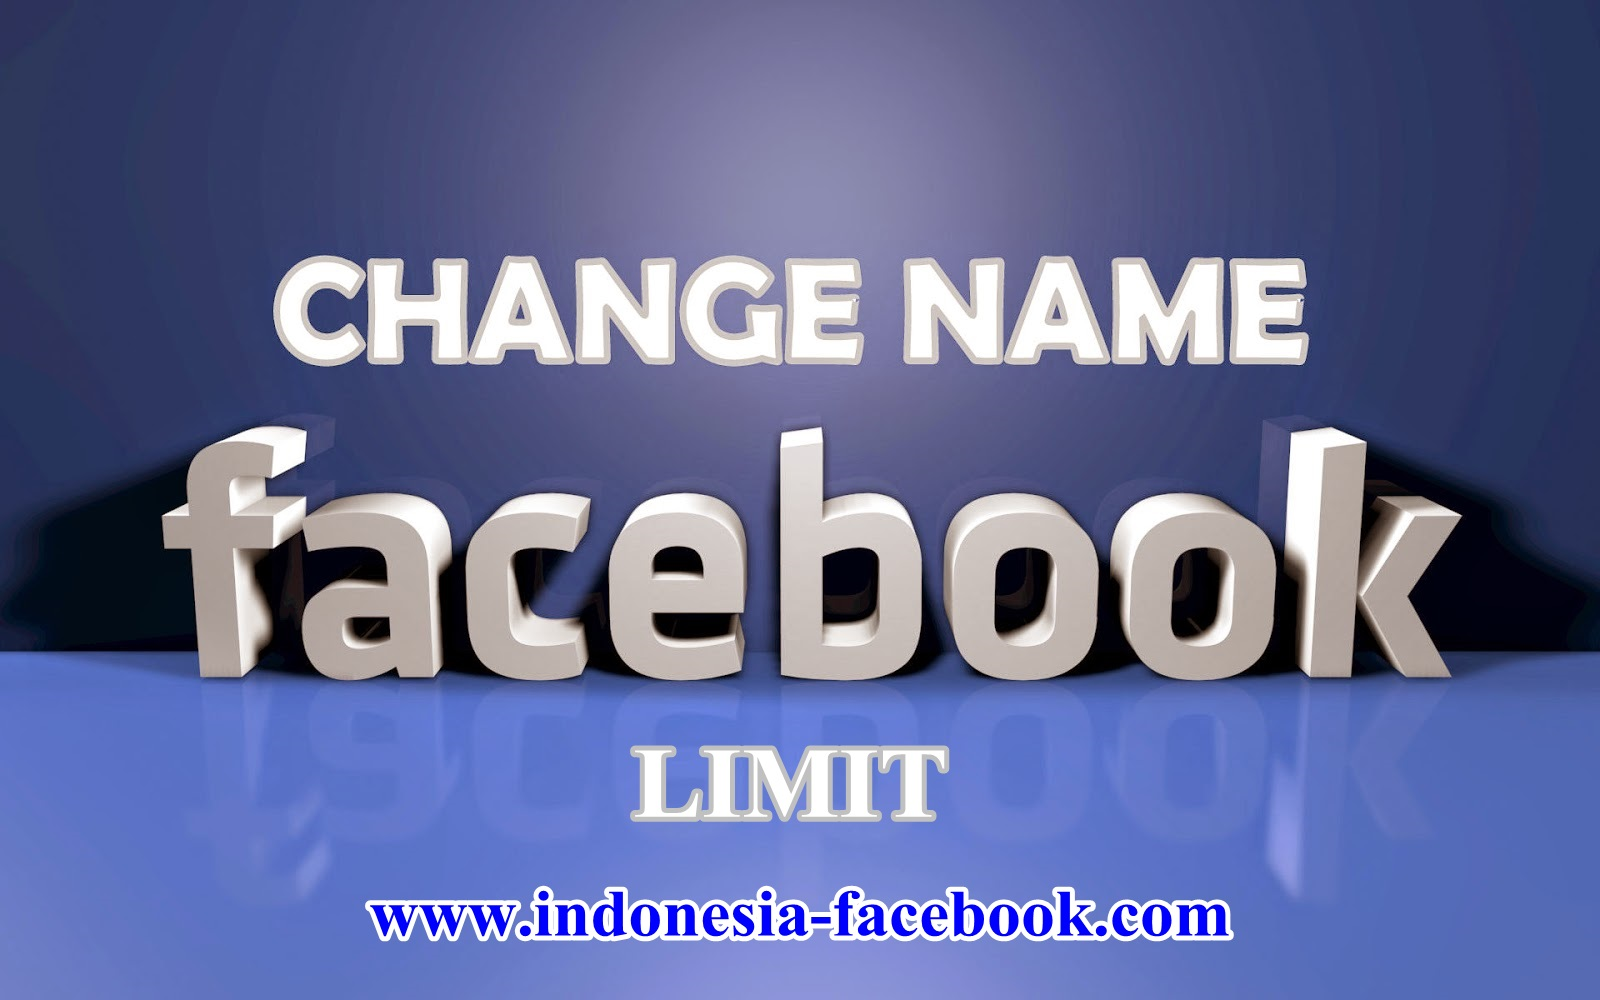 Cara Mudah Ganti Nama Facebook Yang LIMIT